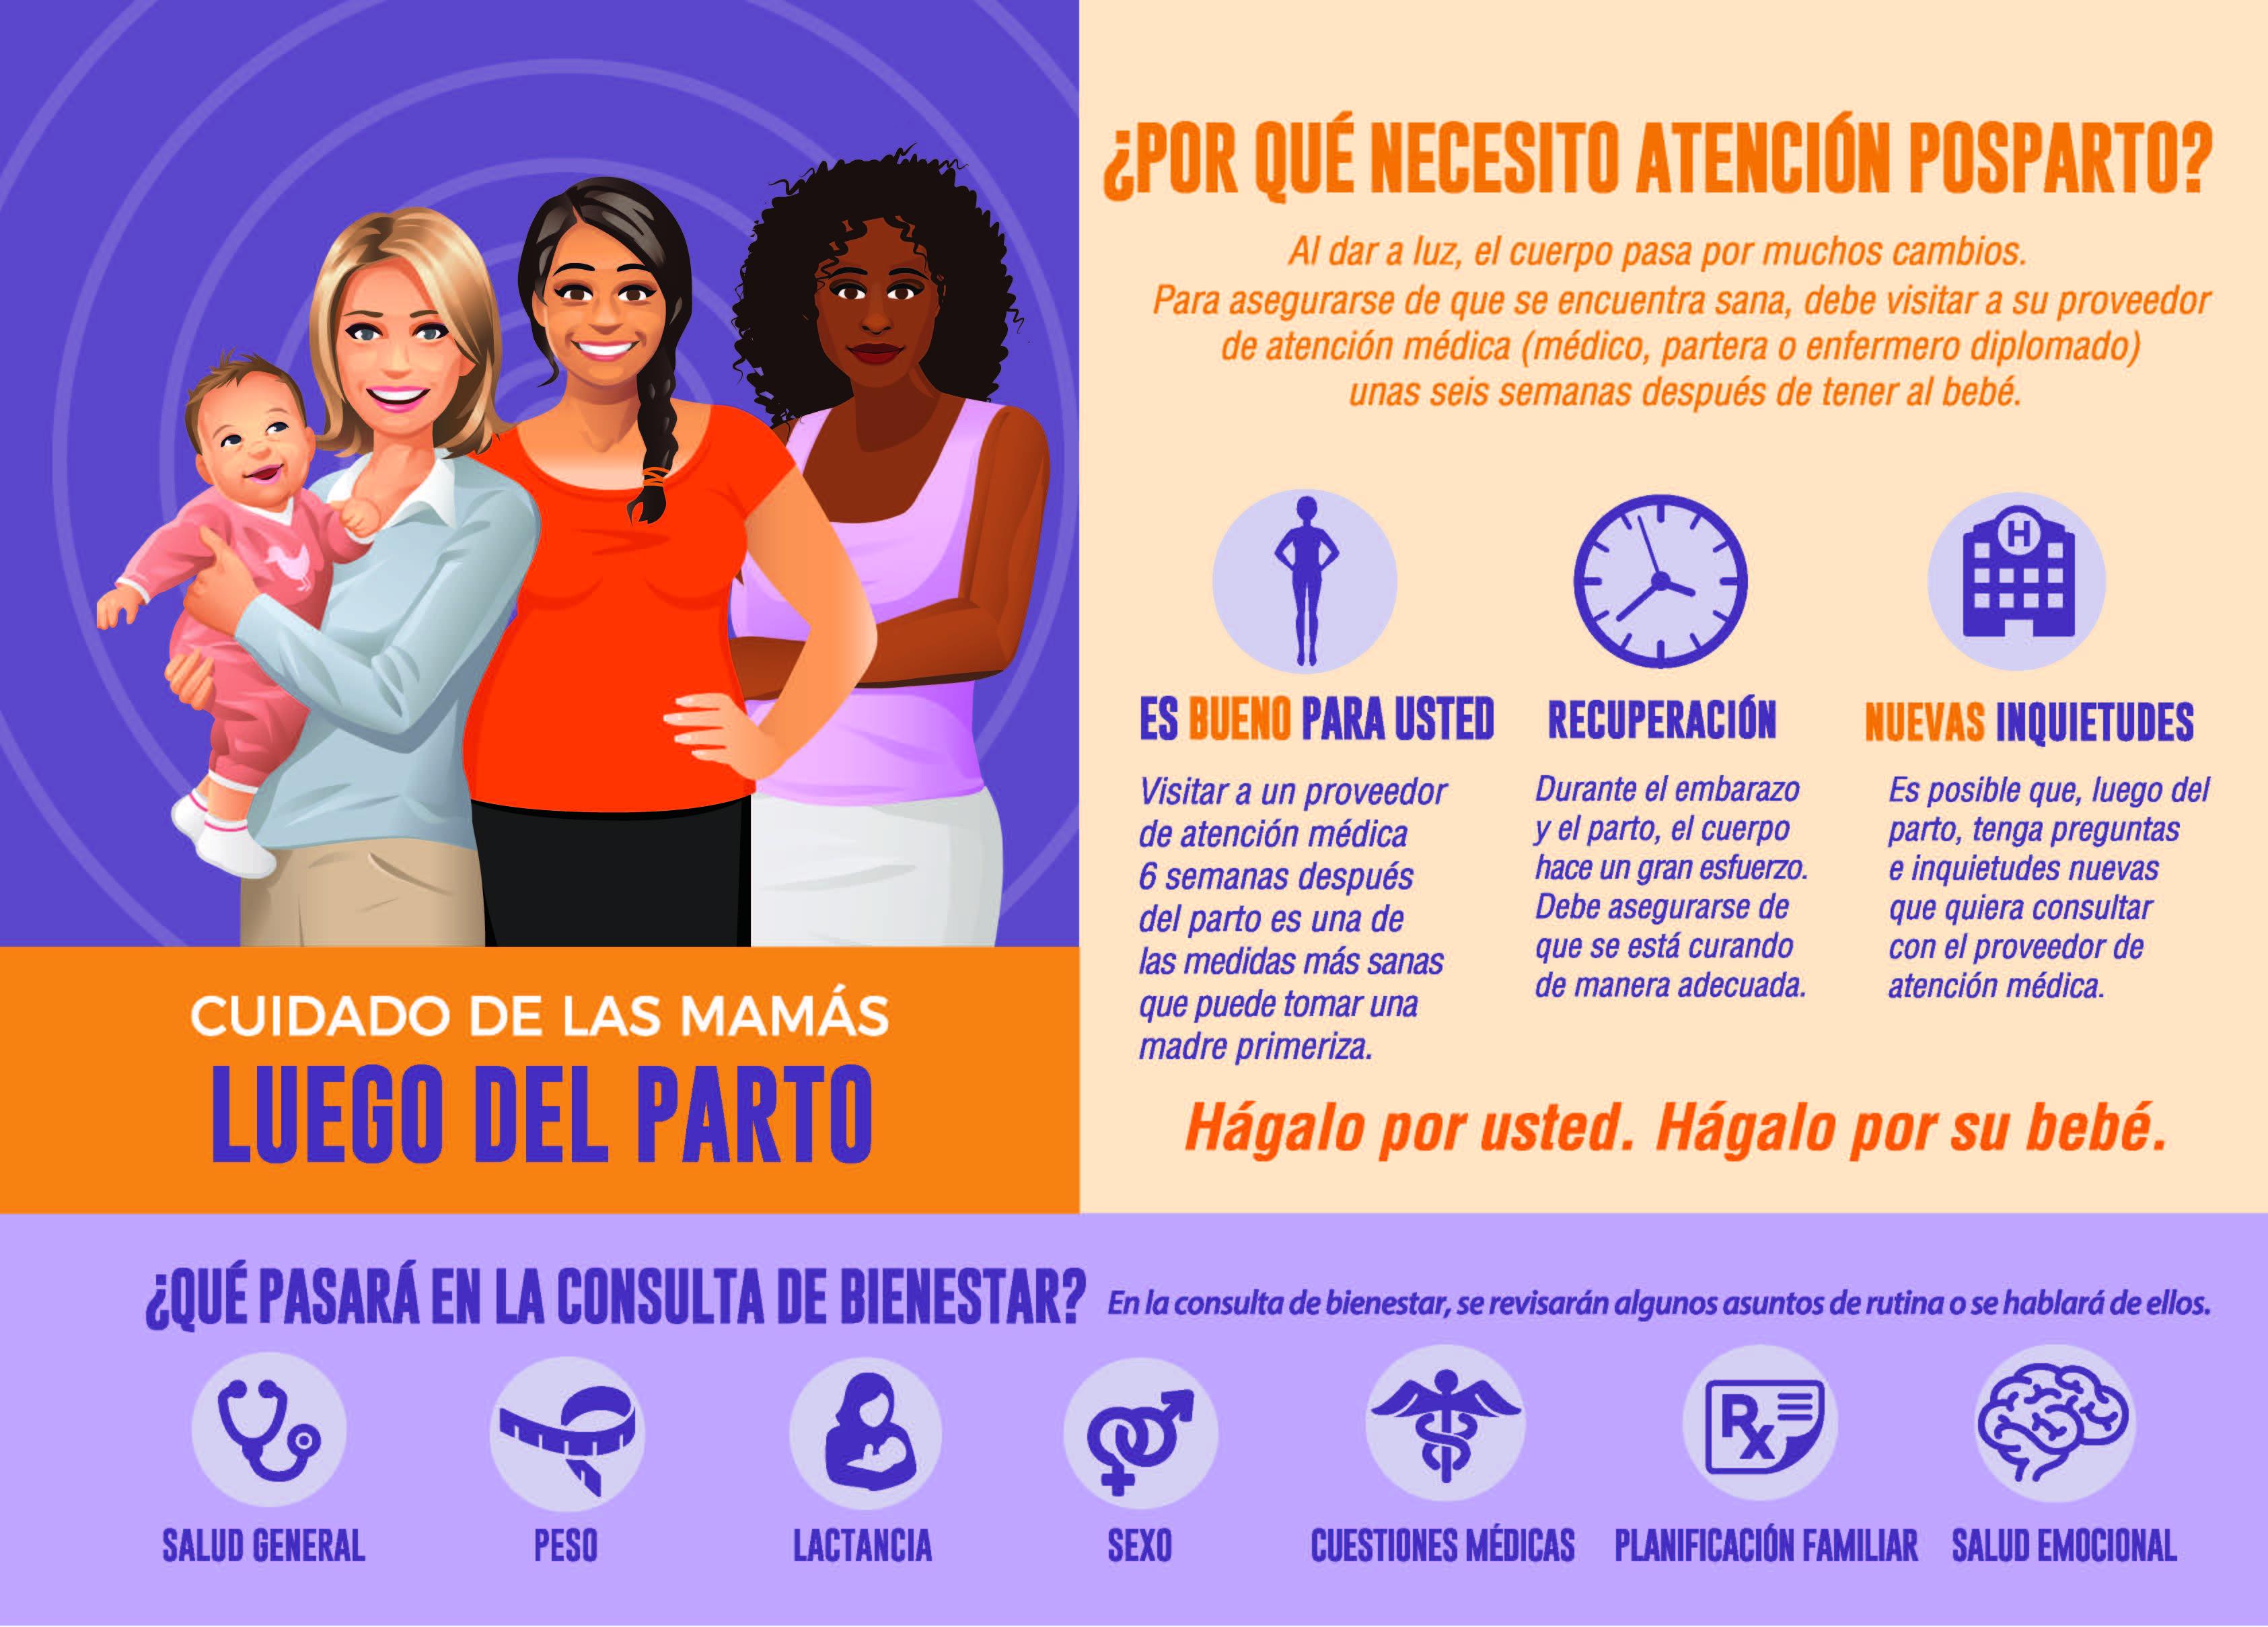 Postpartum Visit Infographic Flyer (Spanish)